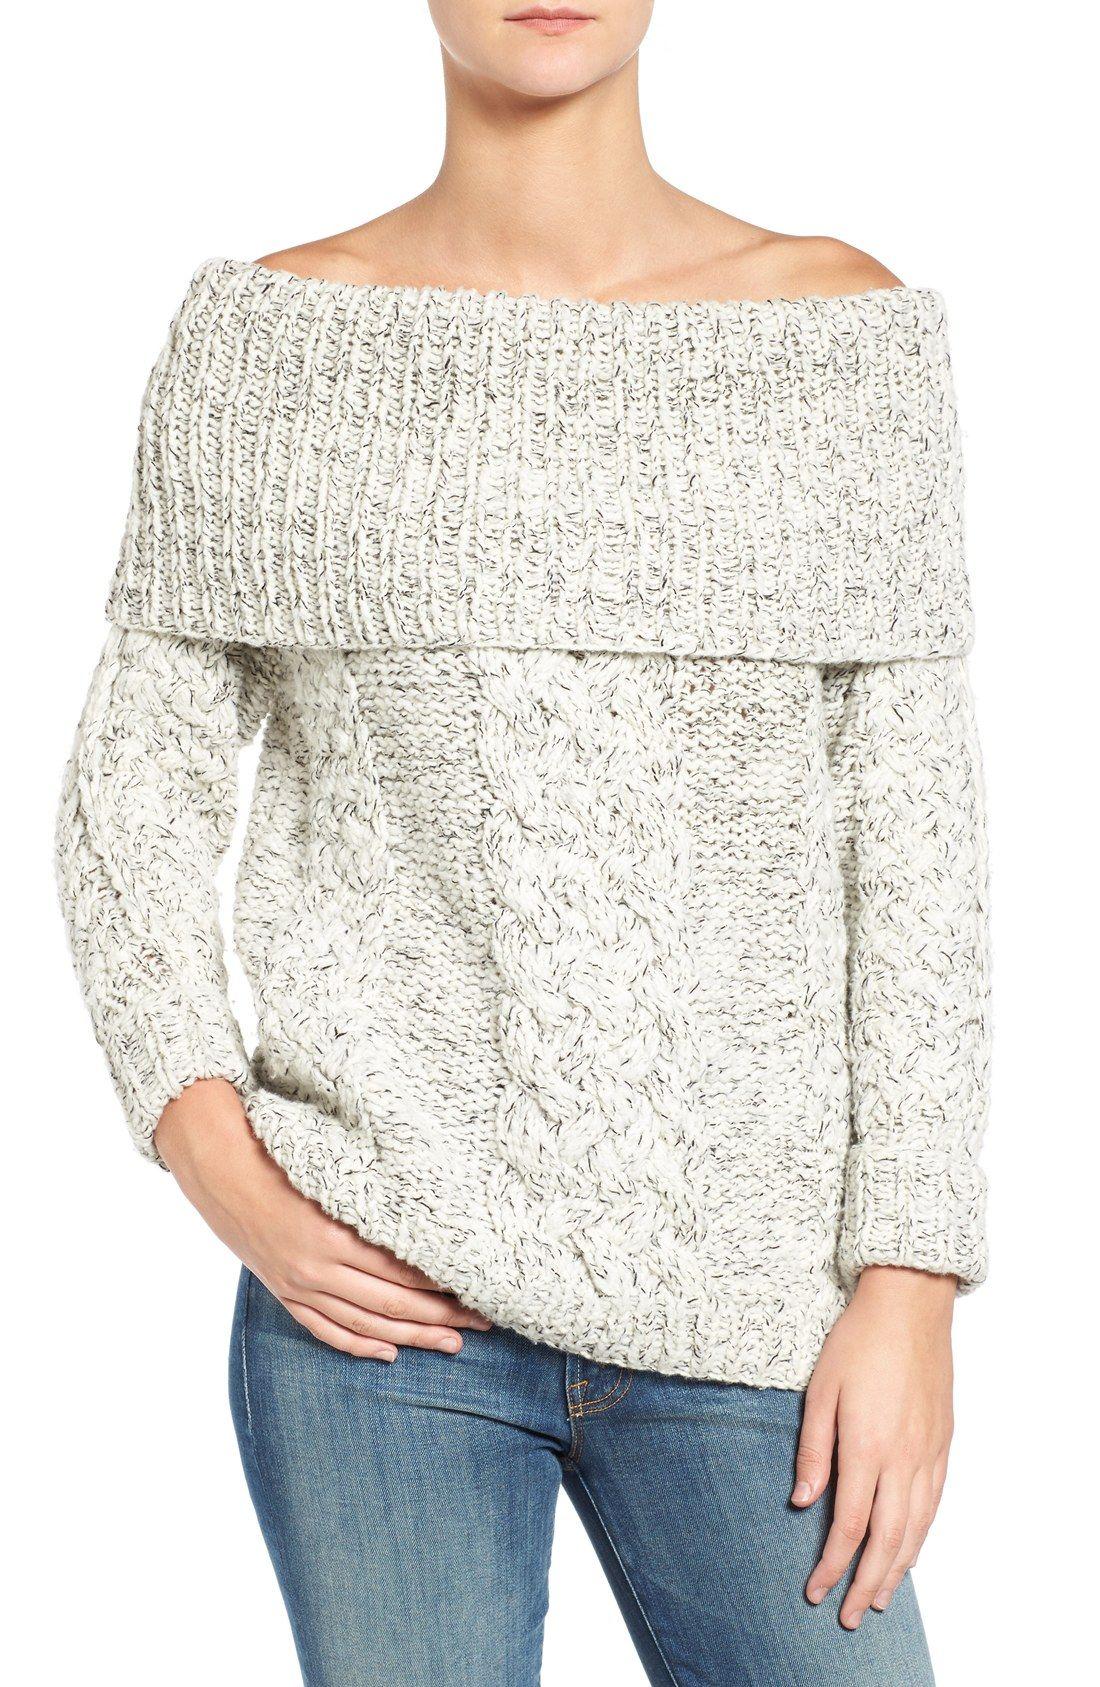 Off the Shoulder Cable Knit Sweater | Stitch Fix | Pinterest ...